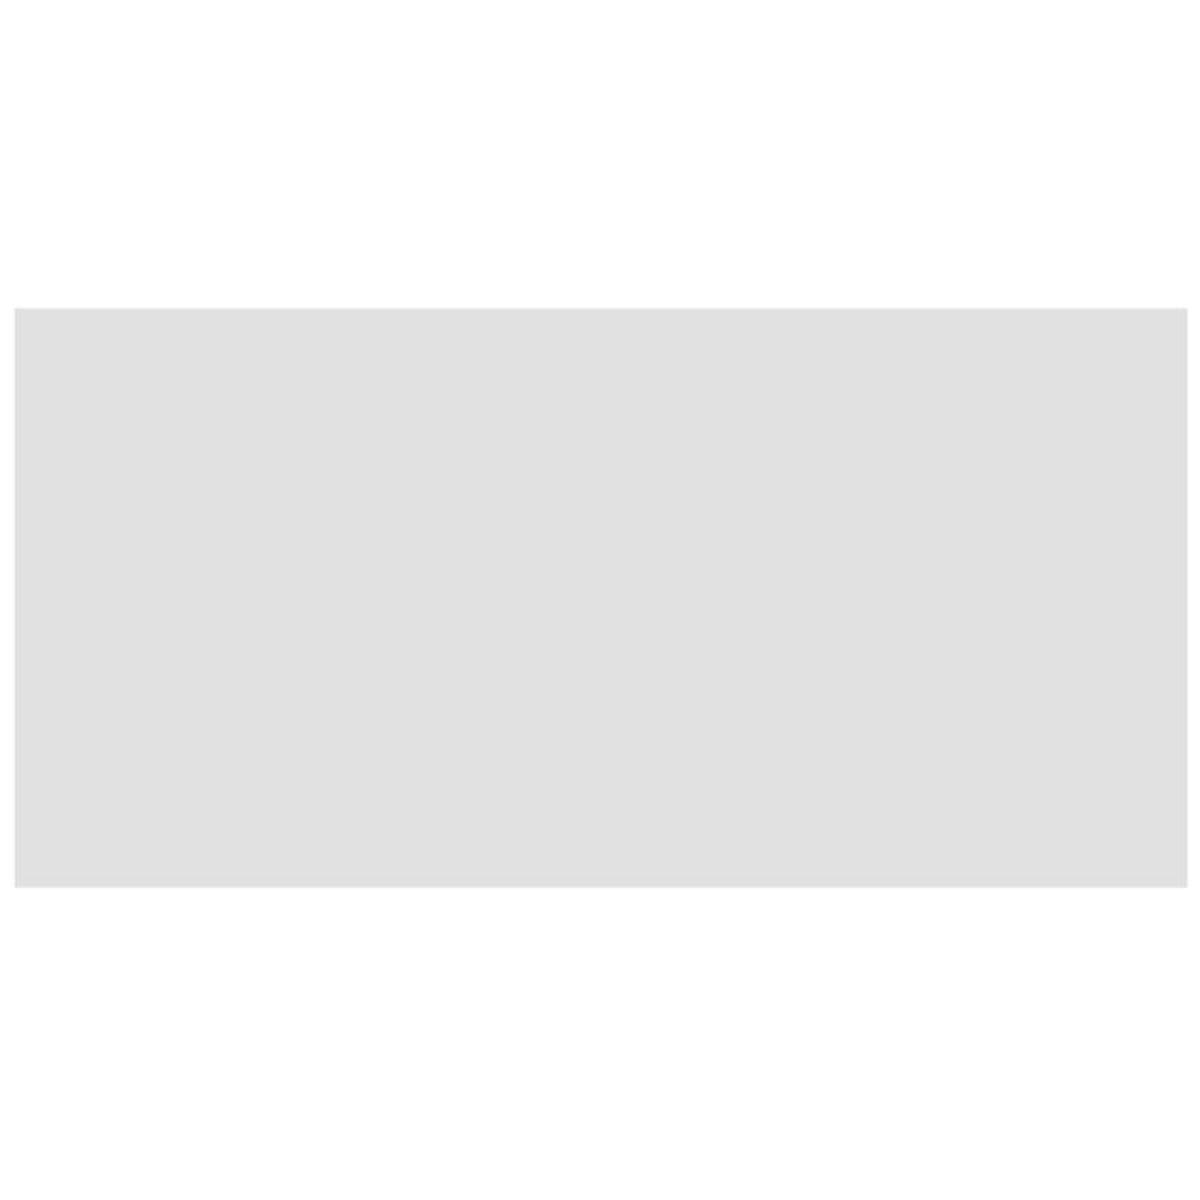 Плитка настенная Дюна 7 60x30 см 1.98 м² цвет белый